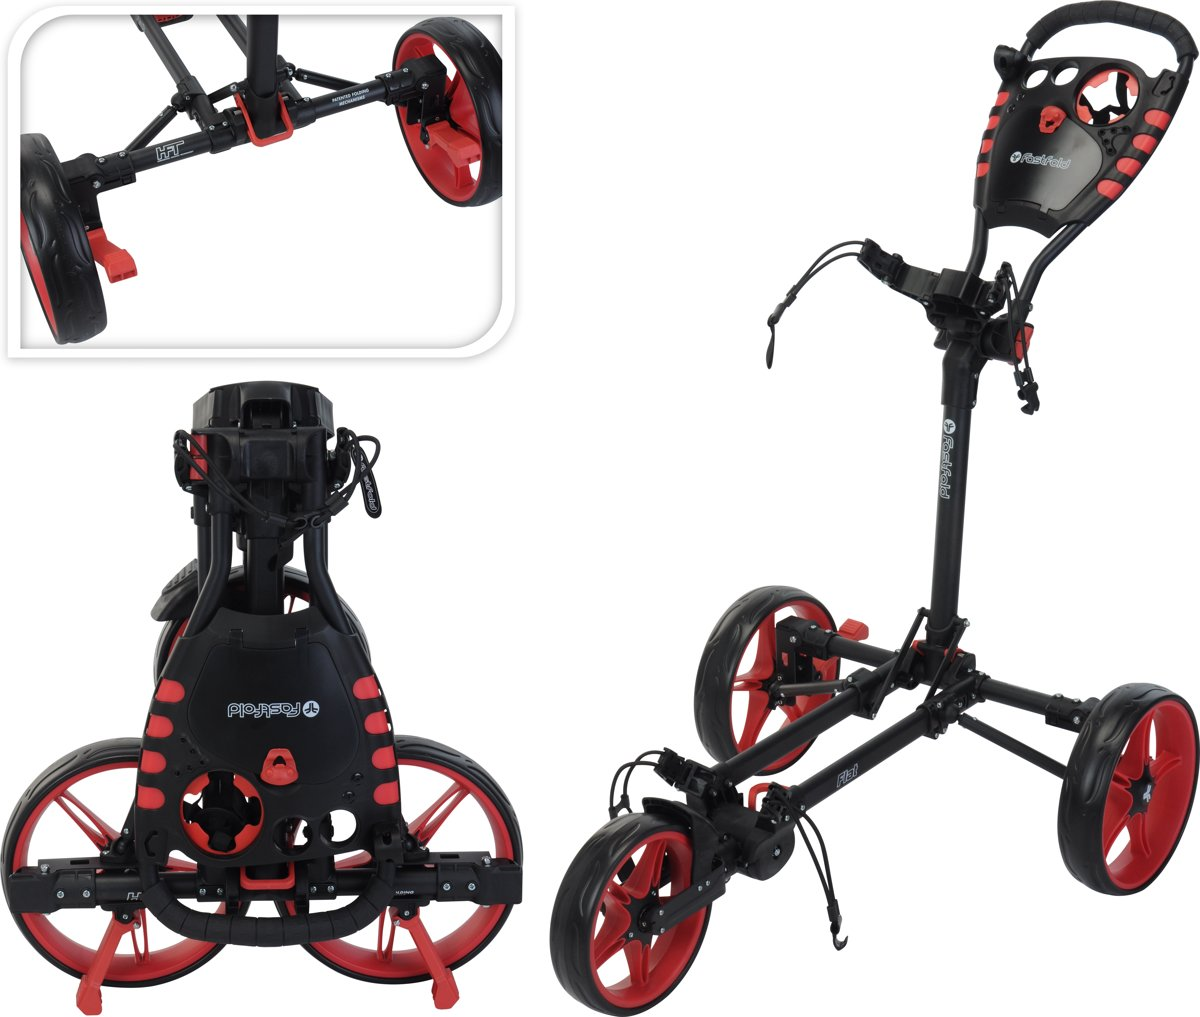 Fastfold - Flat golftrolley - charcoal/rood kopen